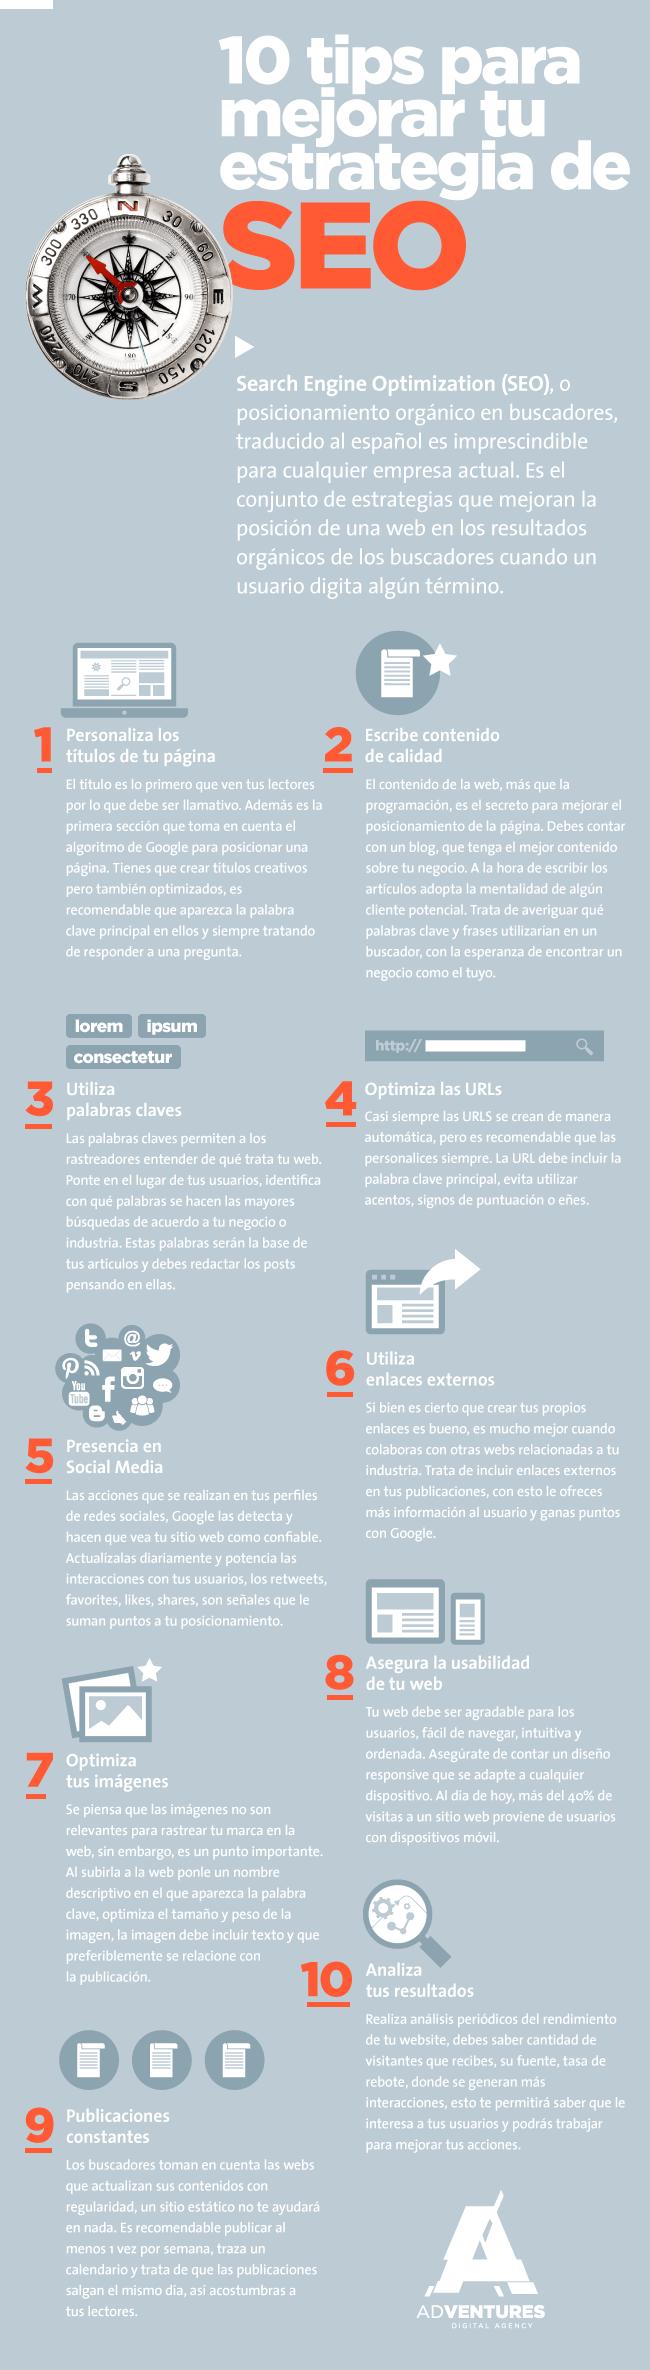 10 consejos para mejorar tu estrategia de SEO